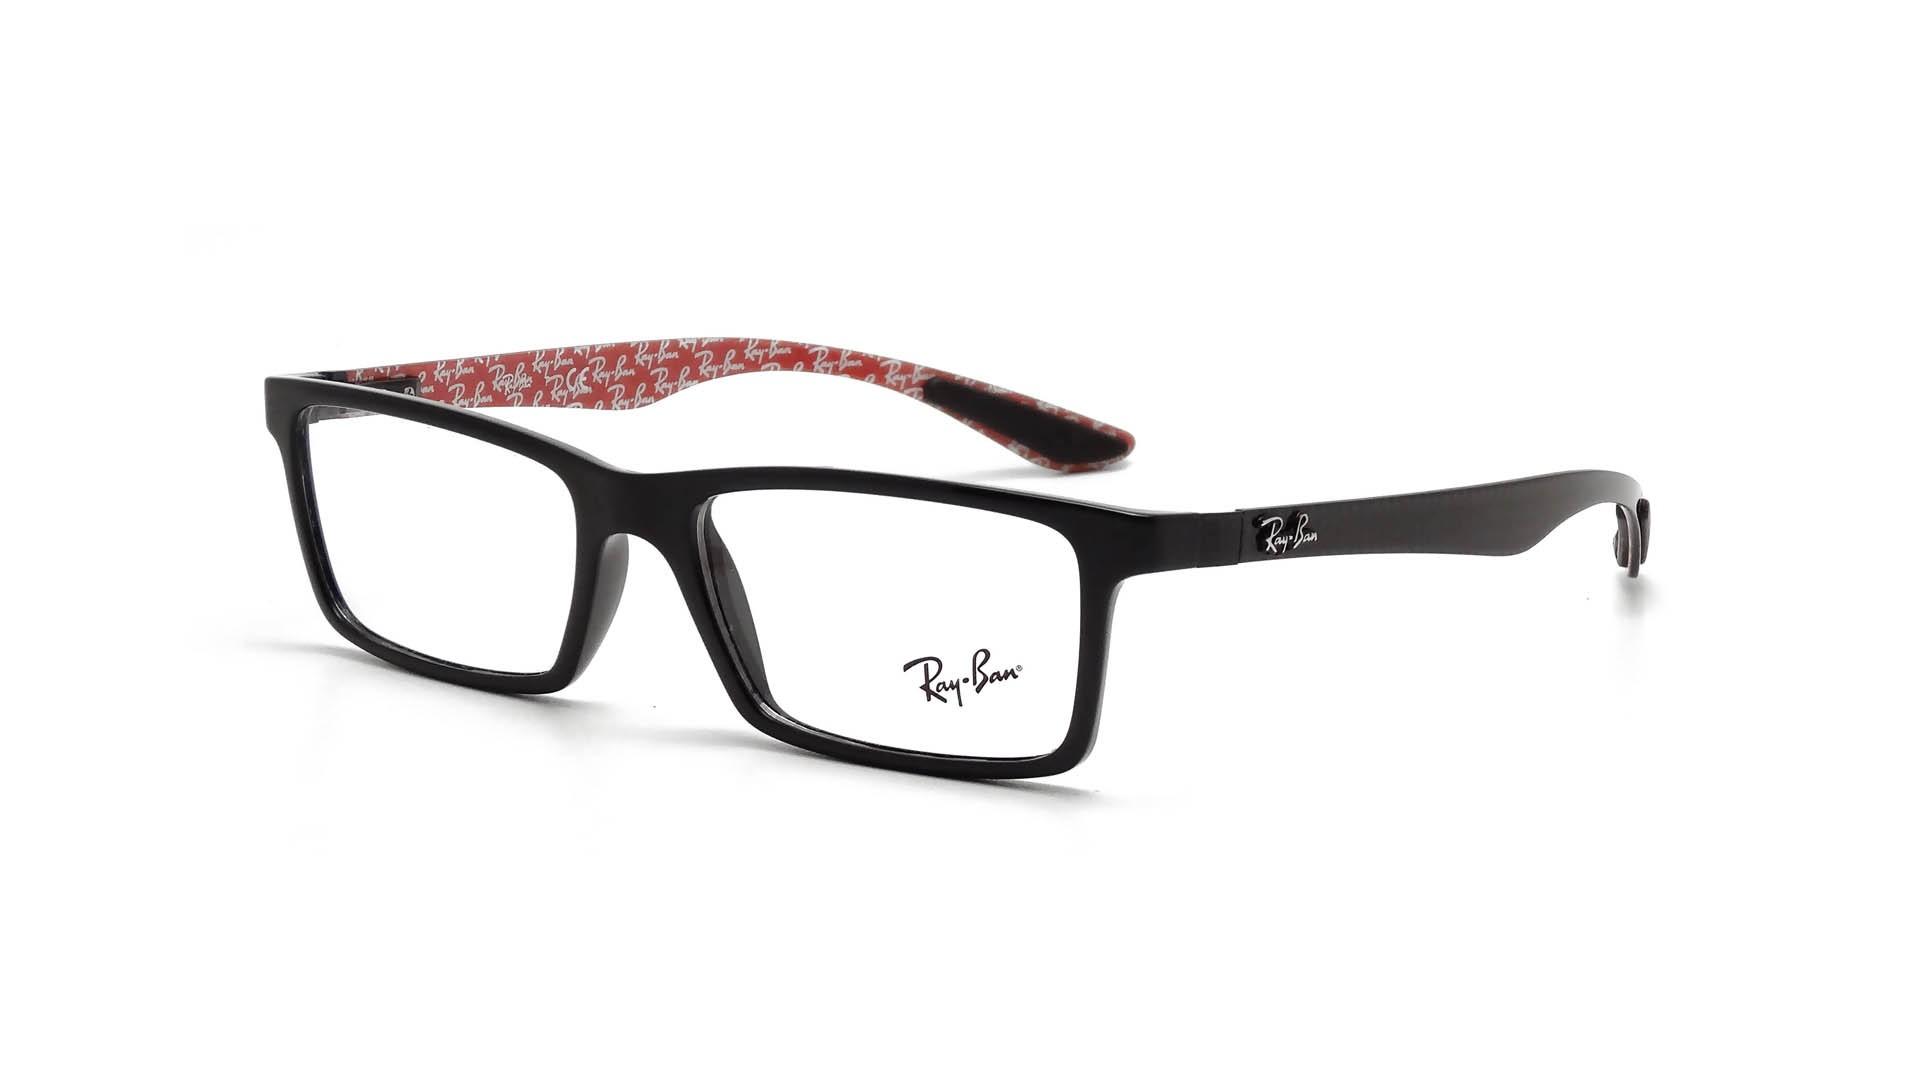 293171cd14 Ray Ban Carbon Fiber Prescription Glasses « Heritage Malta